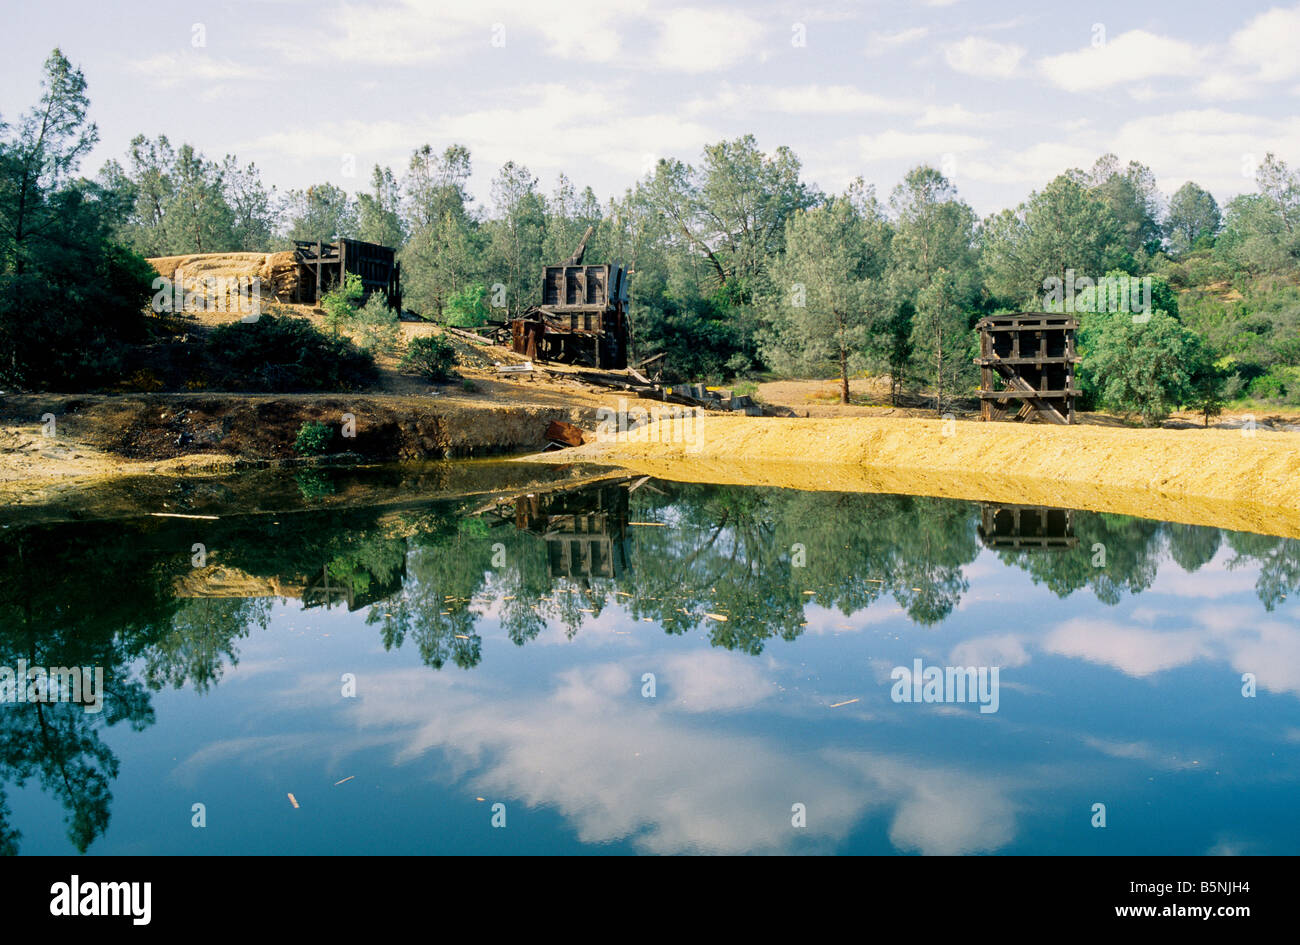 Abandoned copper mine, waste settling pond. - Stock Image